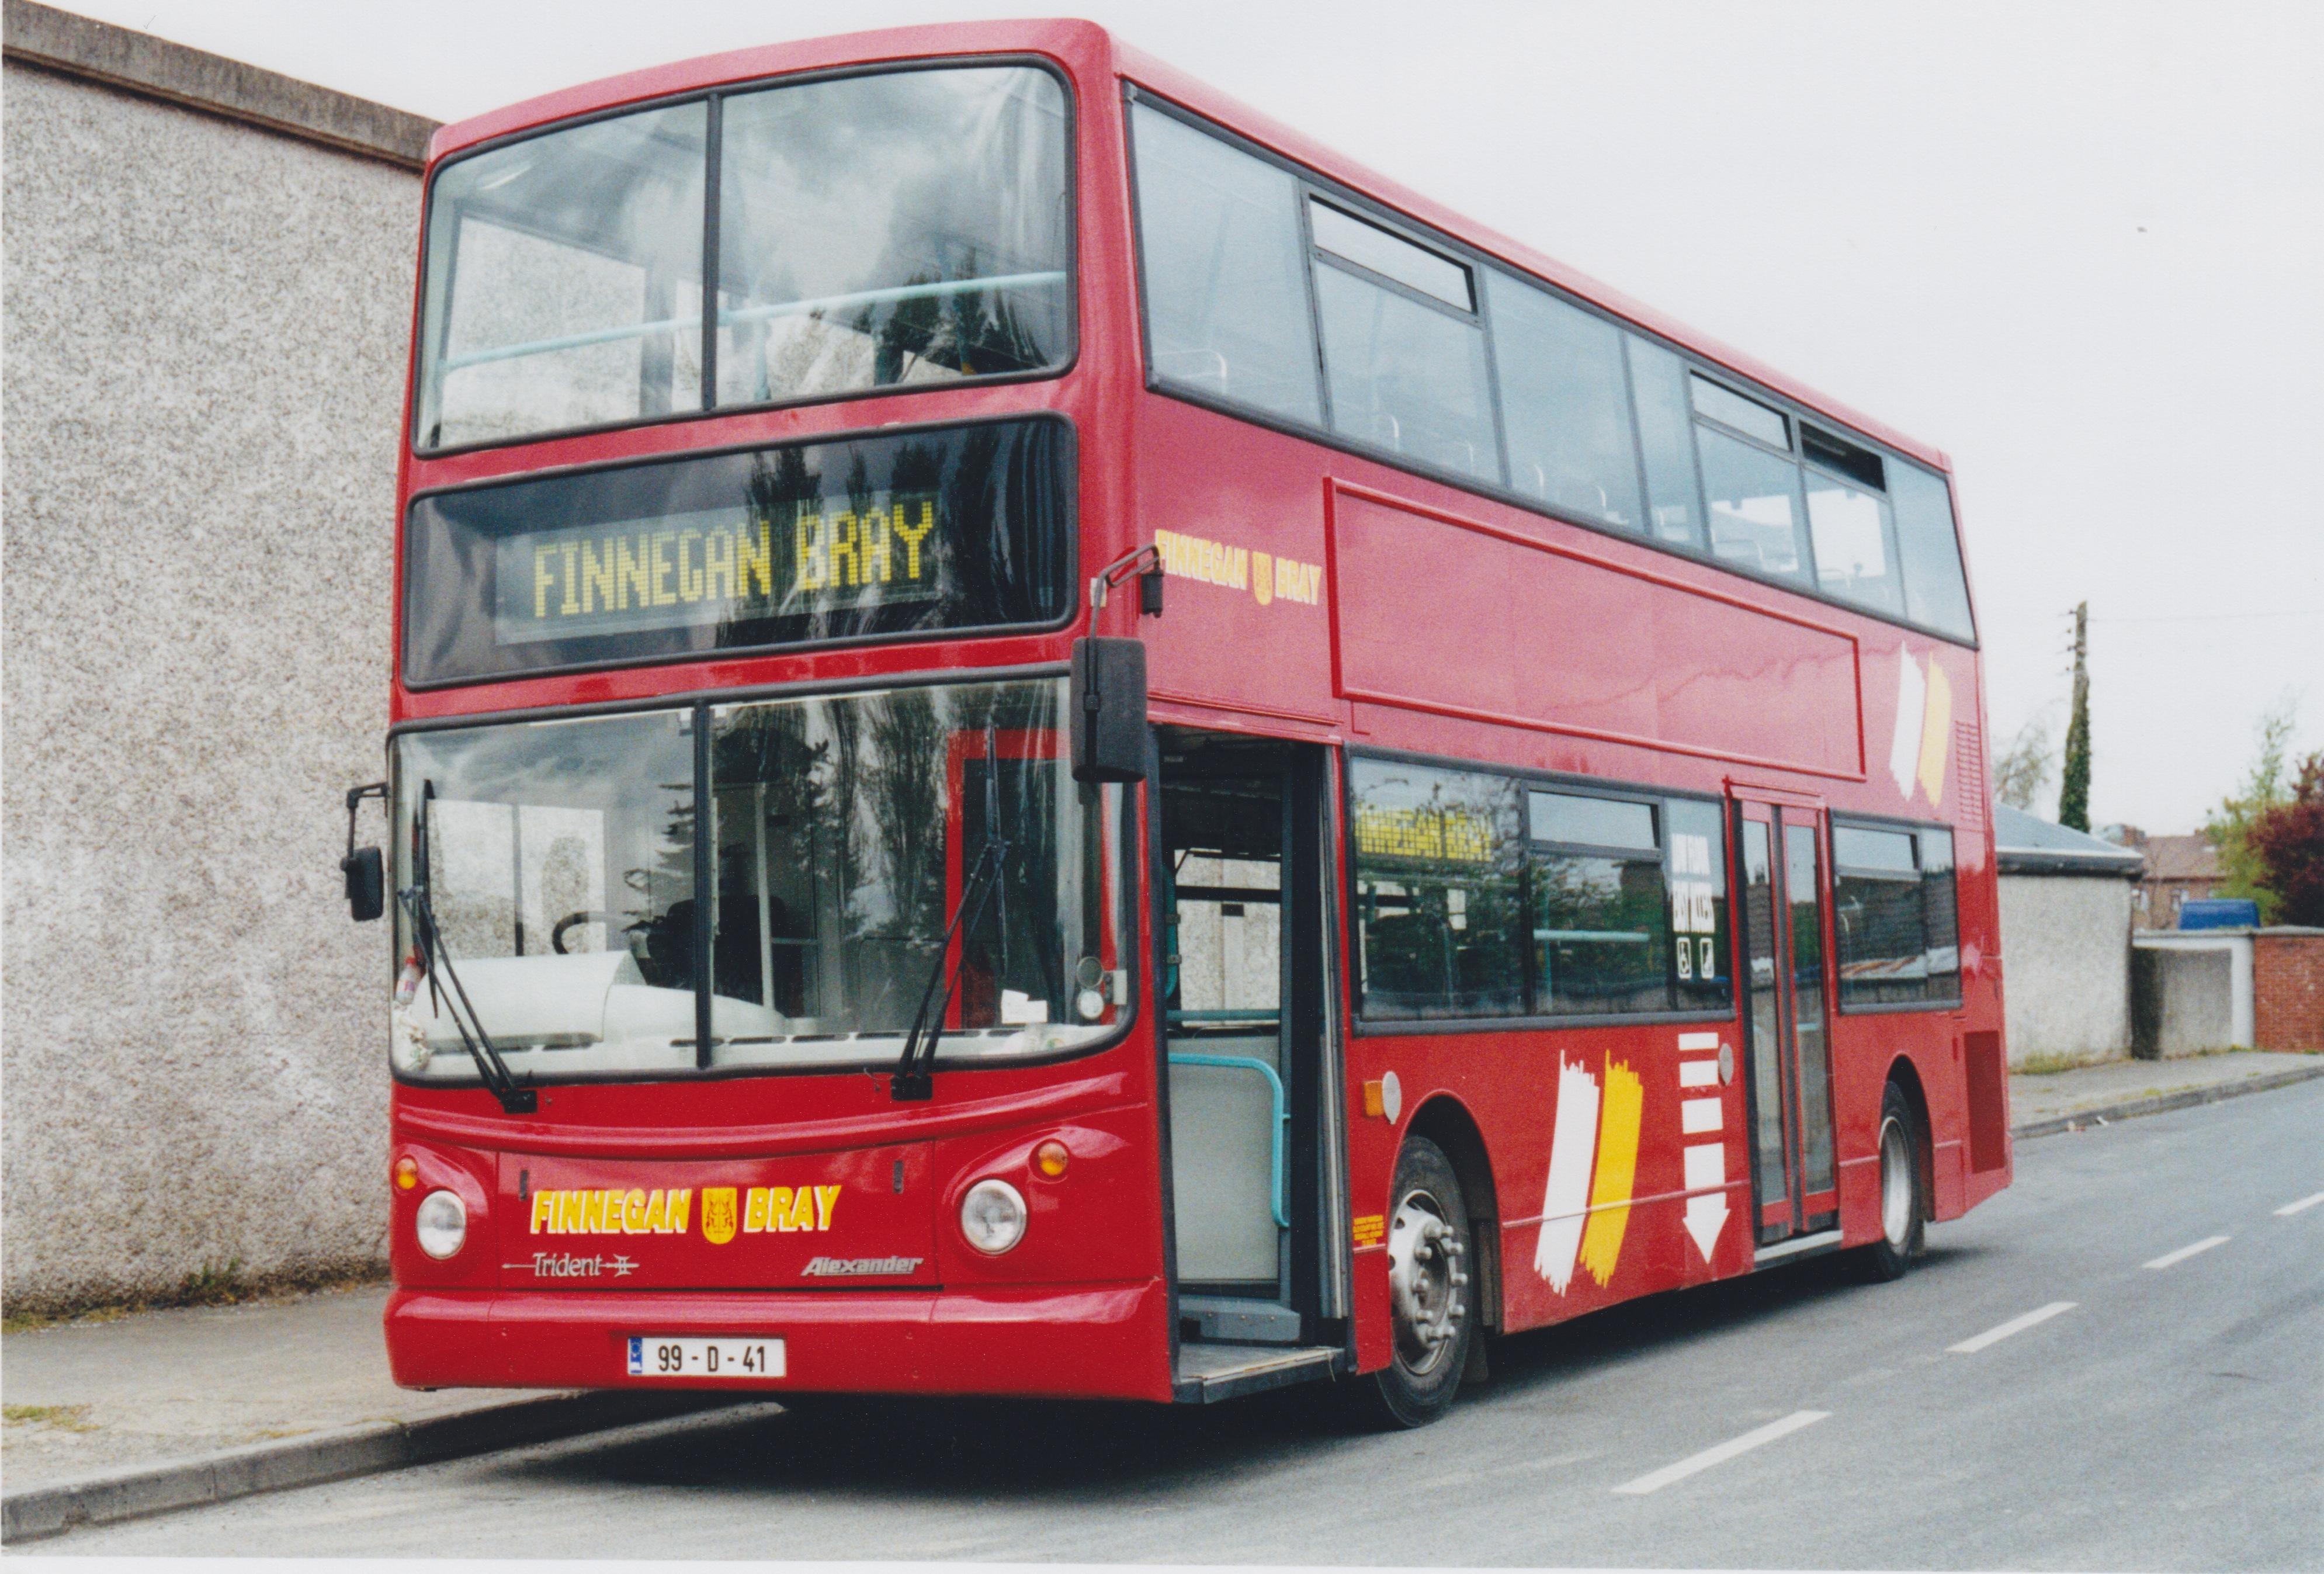 FileFinnegan Of Bray Bus 99 D 41 April 2002